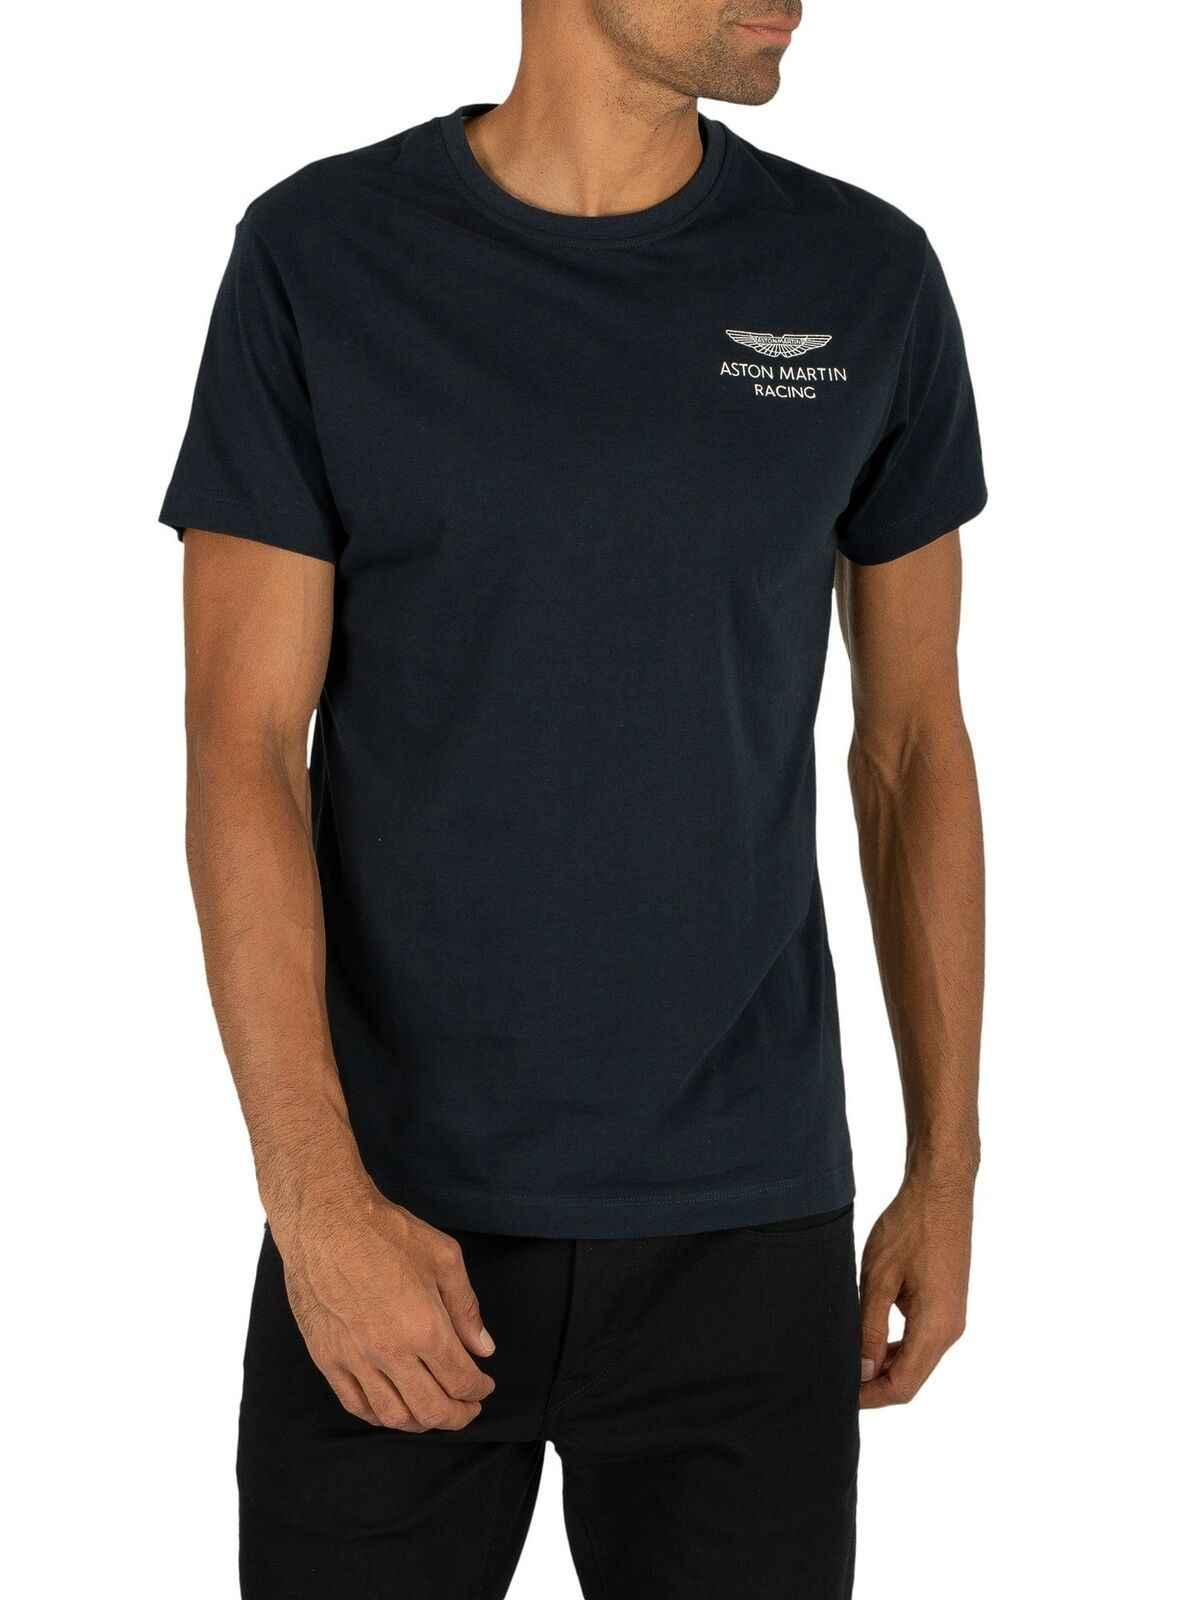 Футболка с логотипом Hackett Men'S London Amr, синяя футболка унисекс, размер S-3Xl